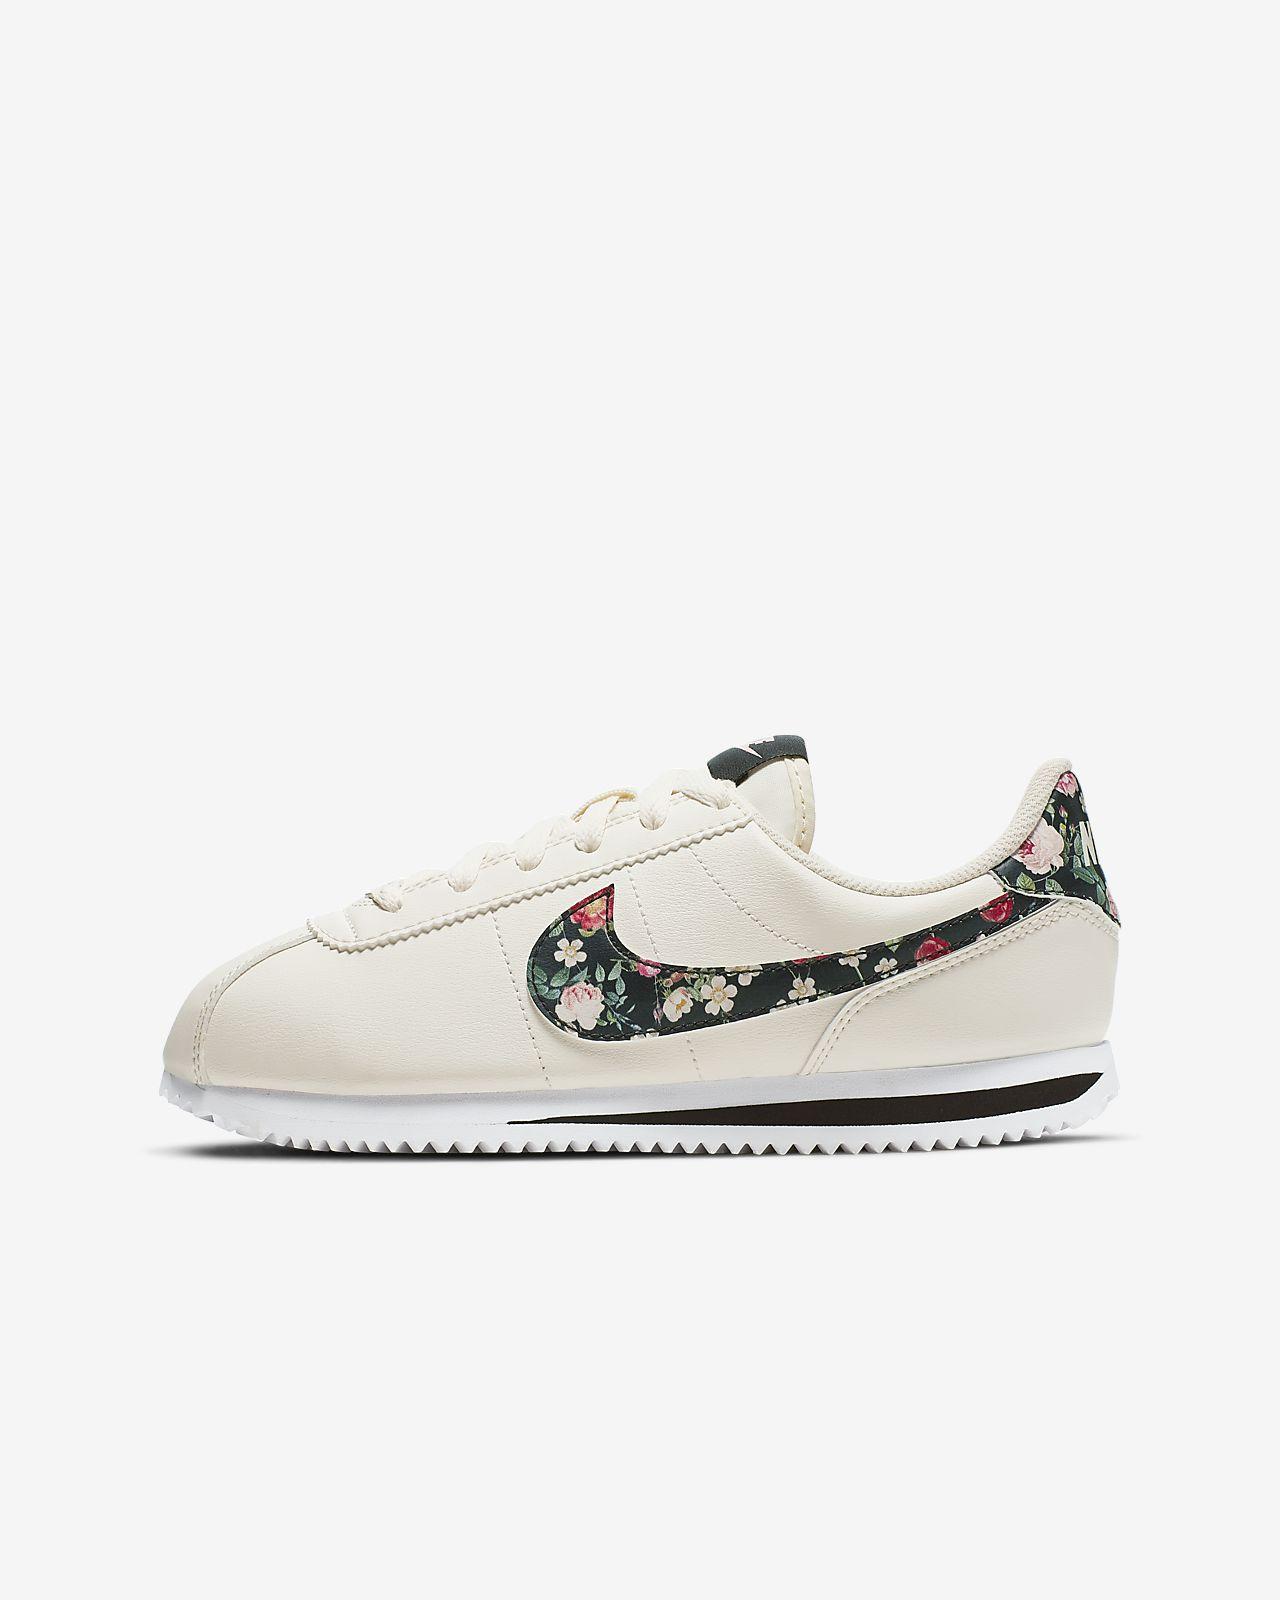 competitive price 01854 5f9f5 Nike Cortez Basic Vintage Floral Big Kids' Shoe